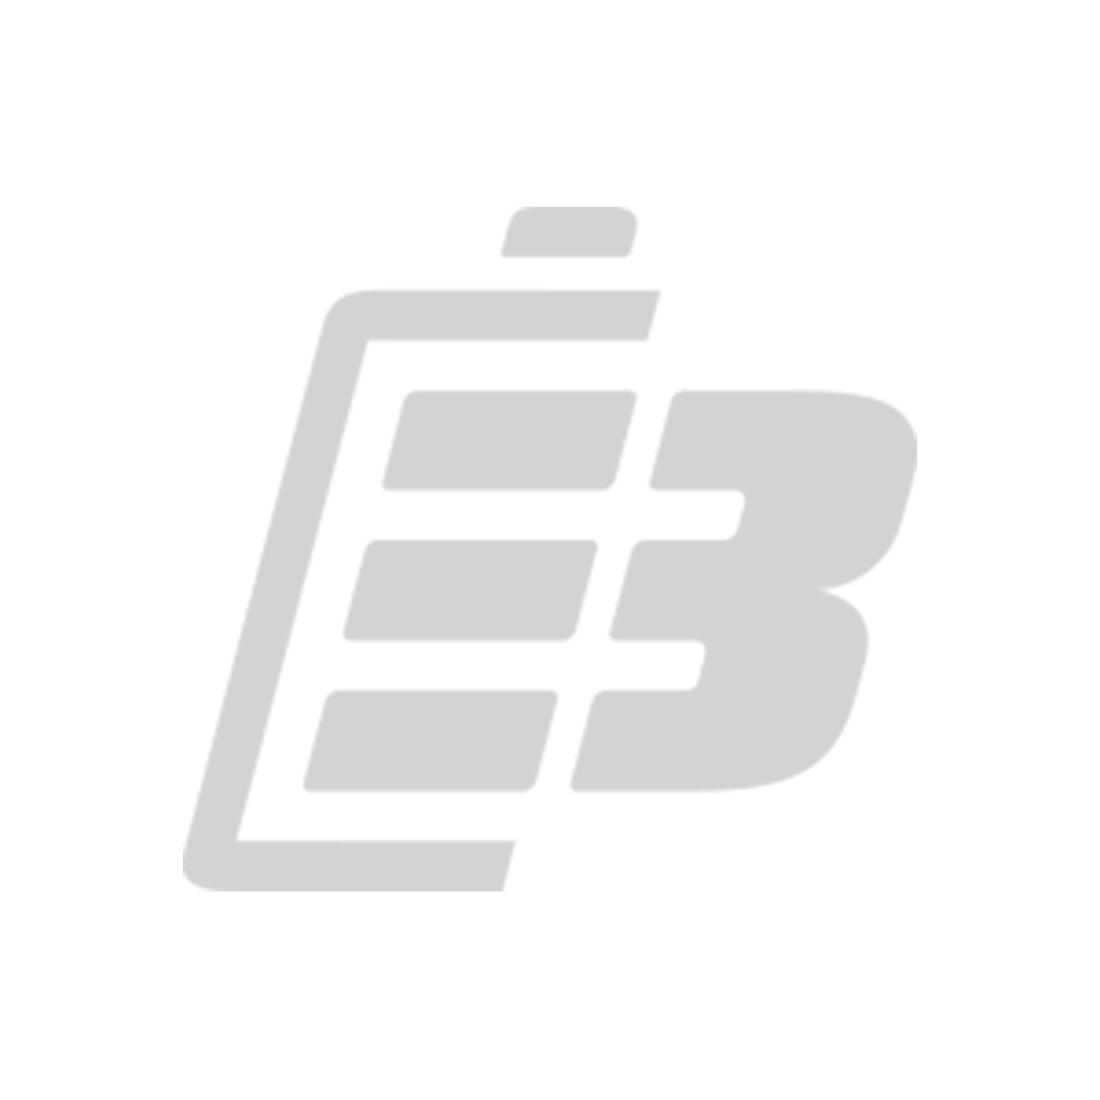 Digital measuring device battery Fluke 700 Calibrator_1